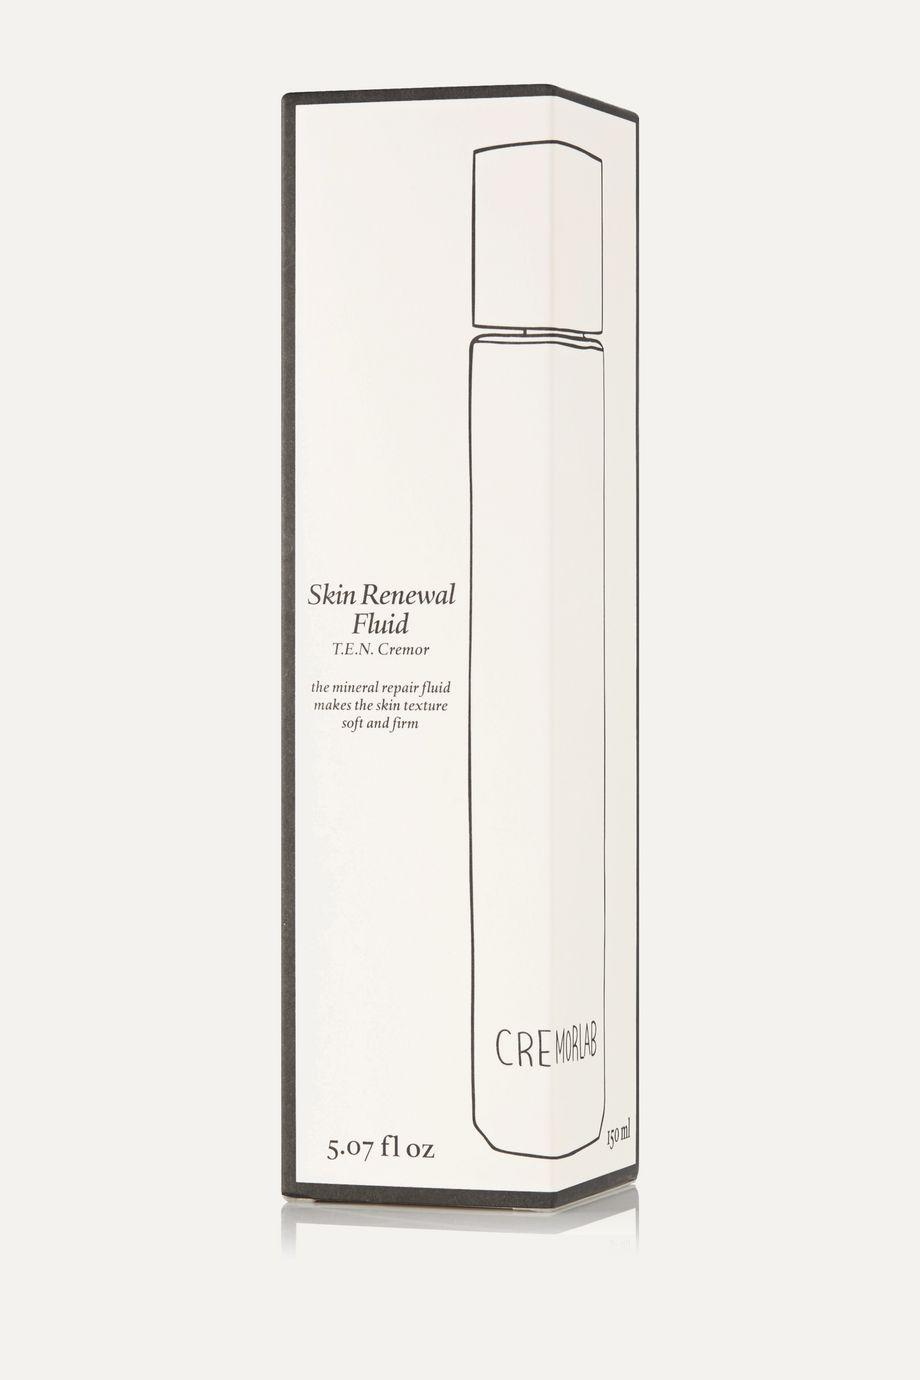 Cremorlab T.E.N. Cremor Skin Renewal Fluid, 150ml